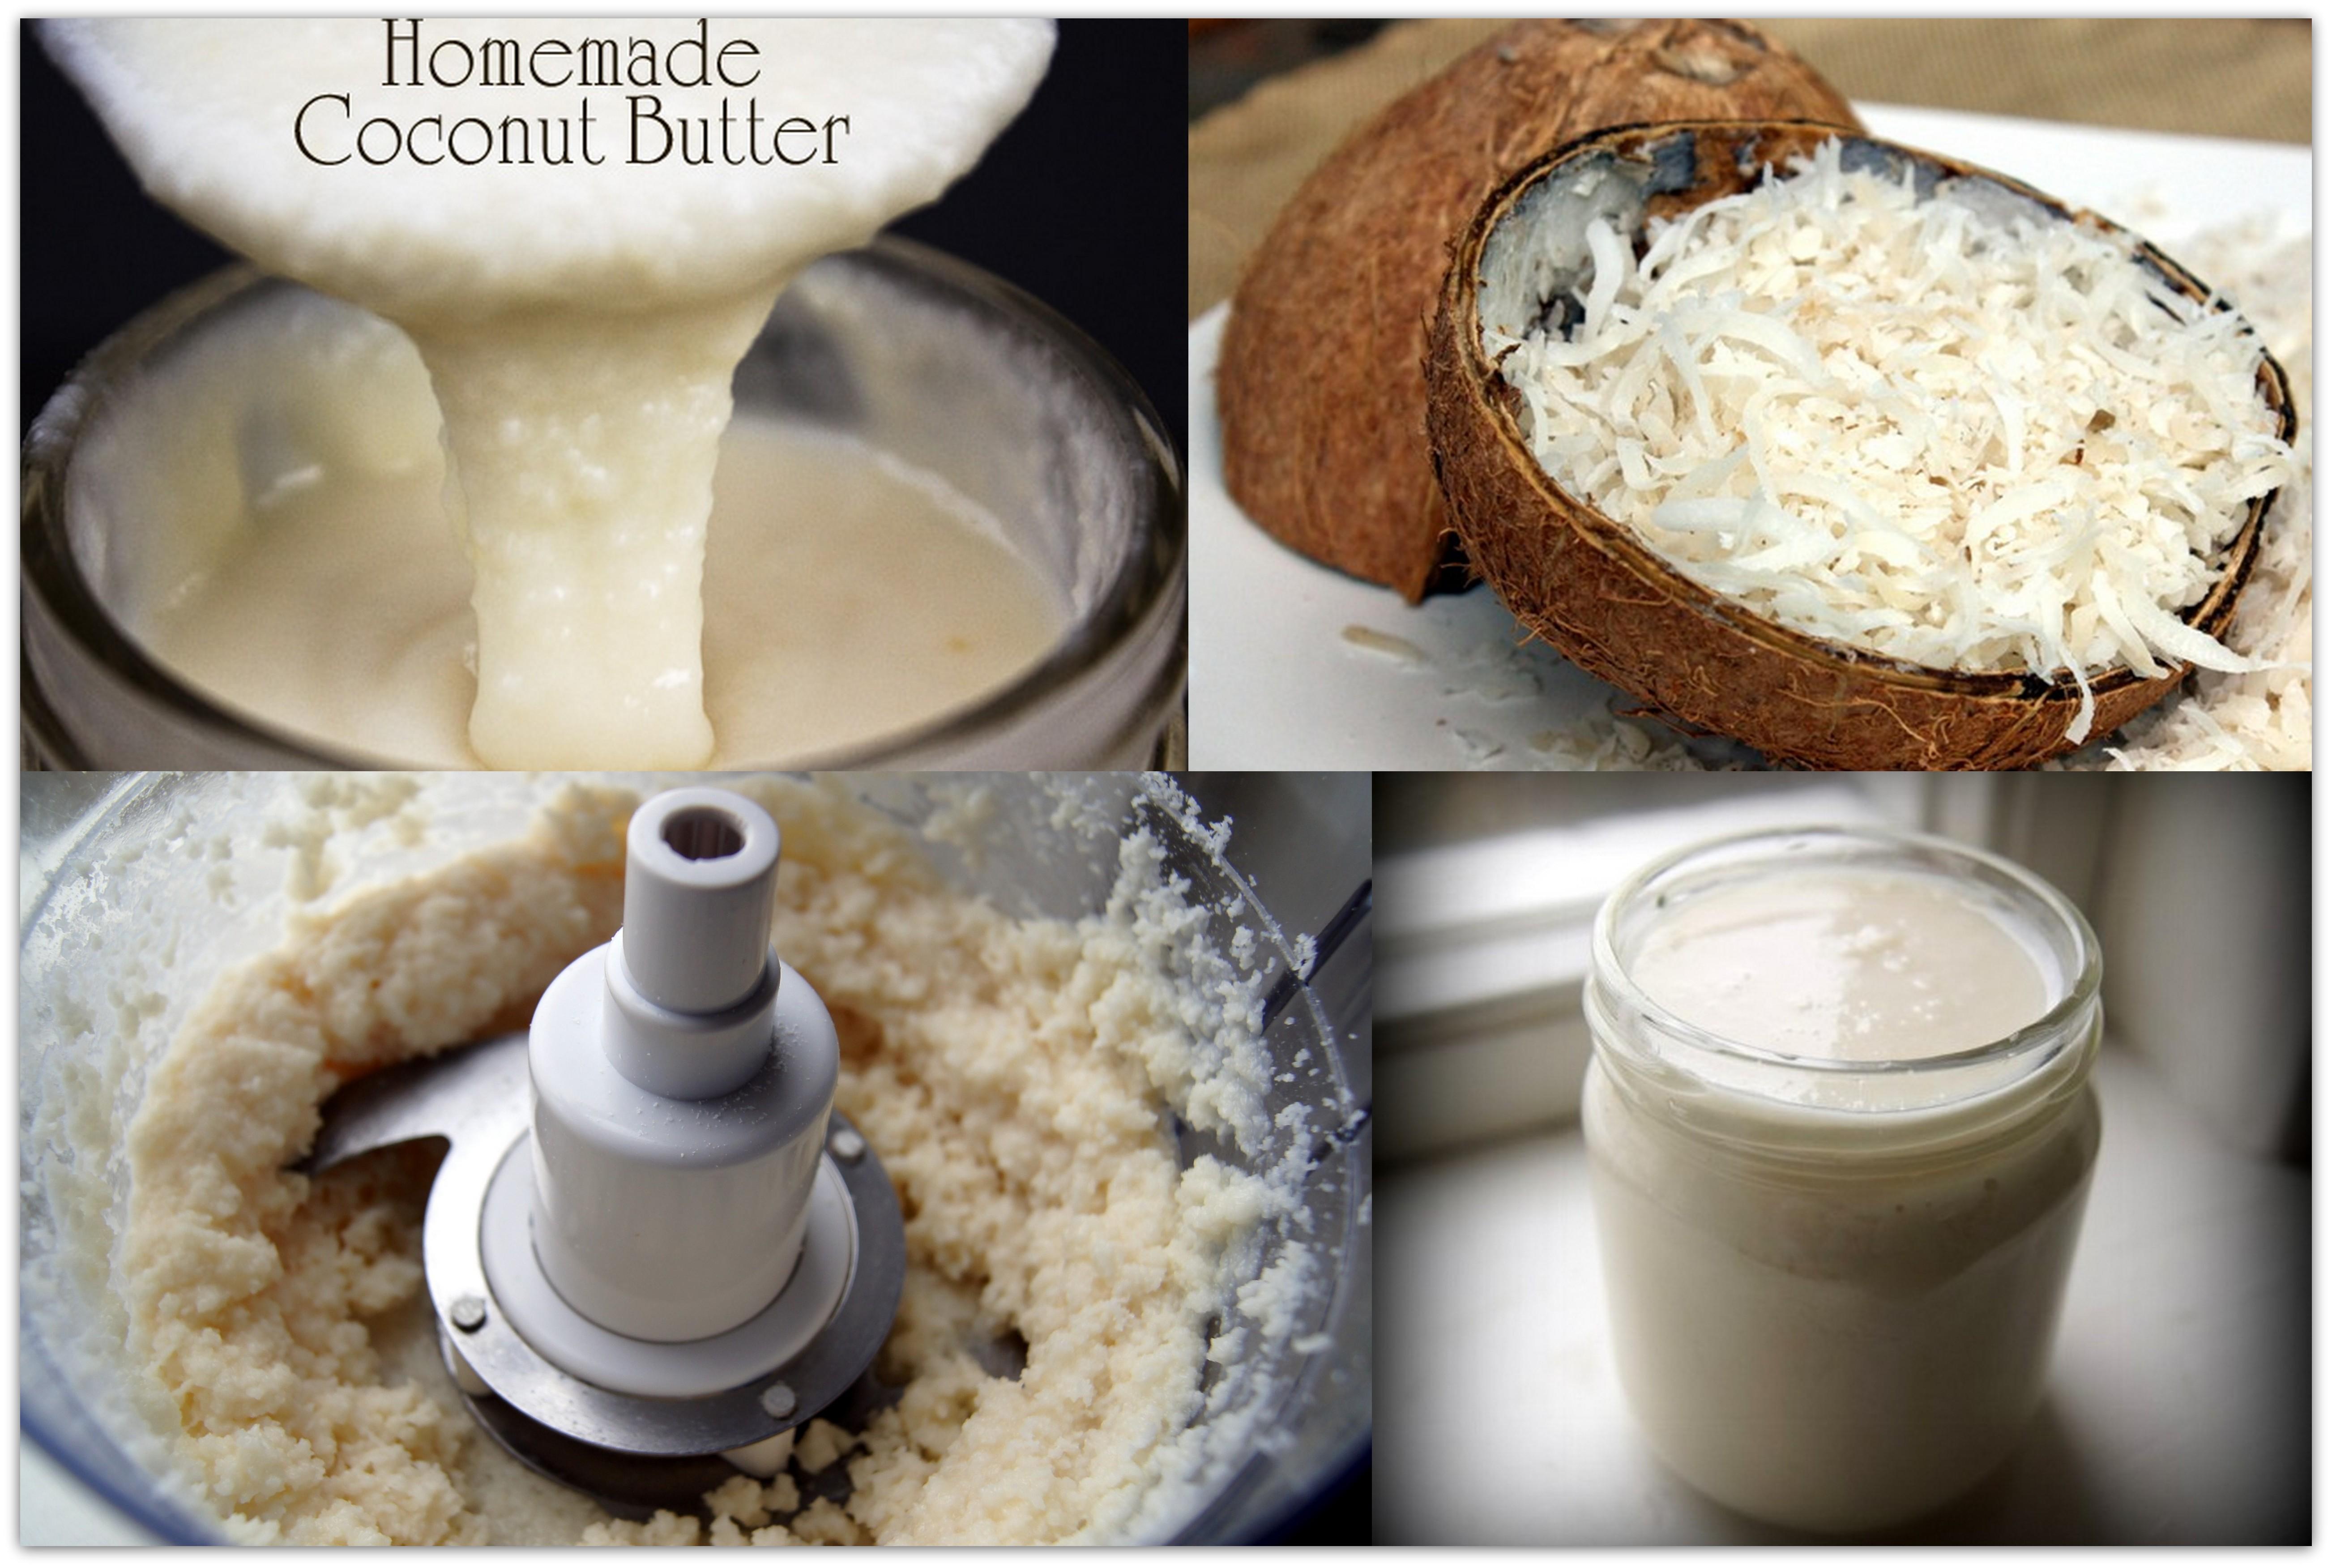 DIY Homemade Coconut Butter | ByzantineFlowers